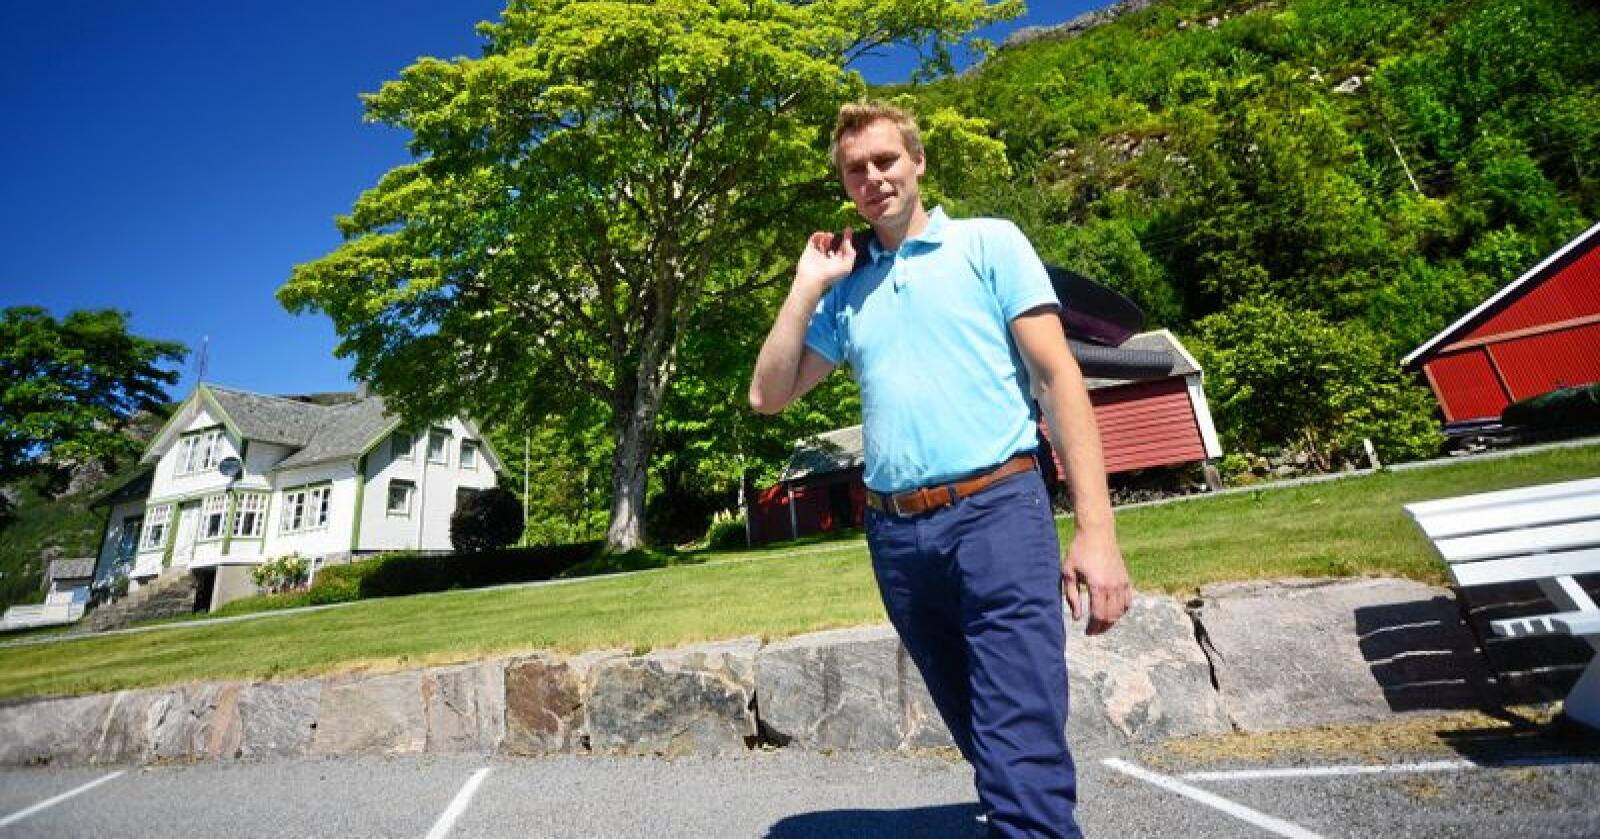 Ola Borten Moe er nestleder i Senterpartiet. Foto: Siri Juell Rasmussen